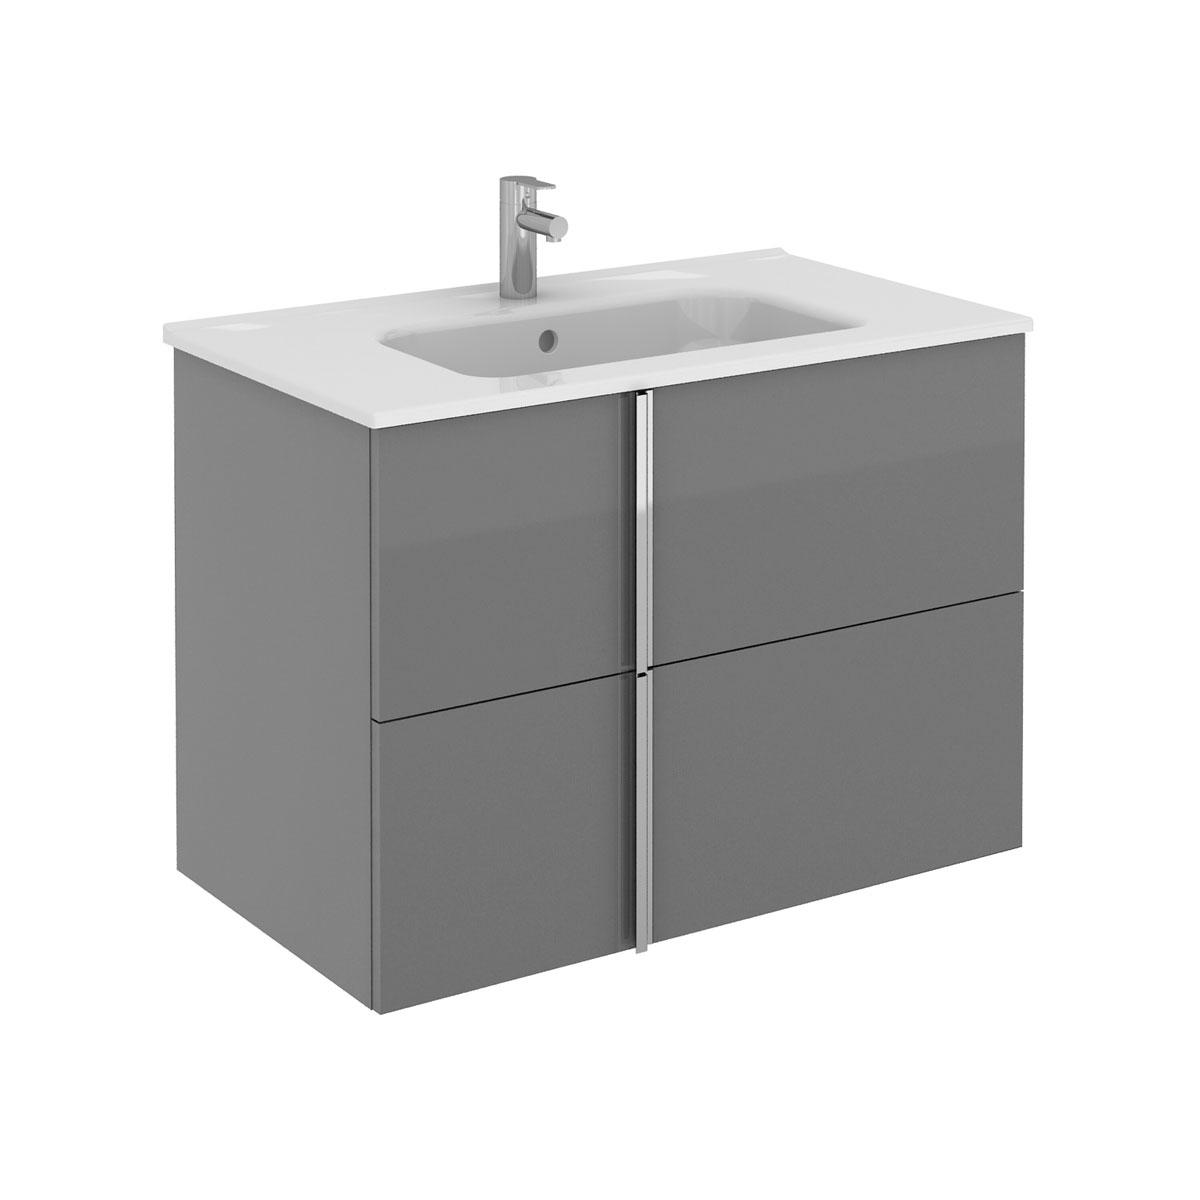 Royo Onix 2 Drawer Wall Hung Vanity Unit Basin Graphite 810mm